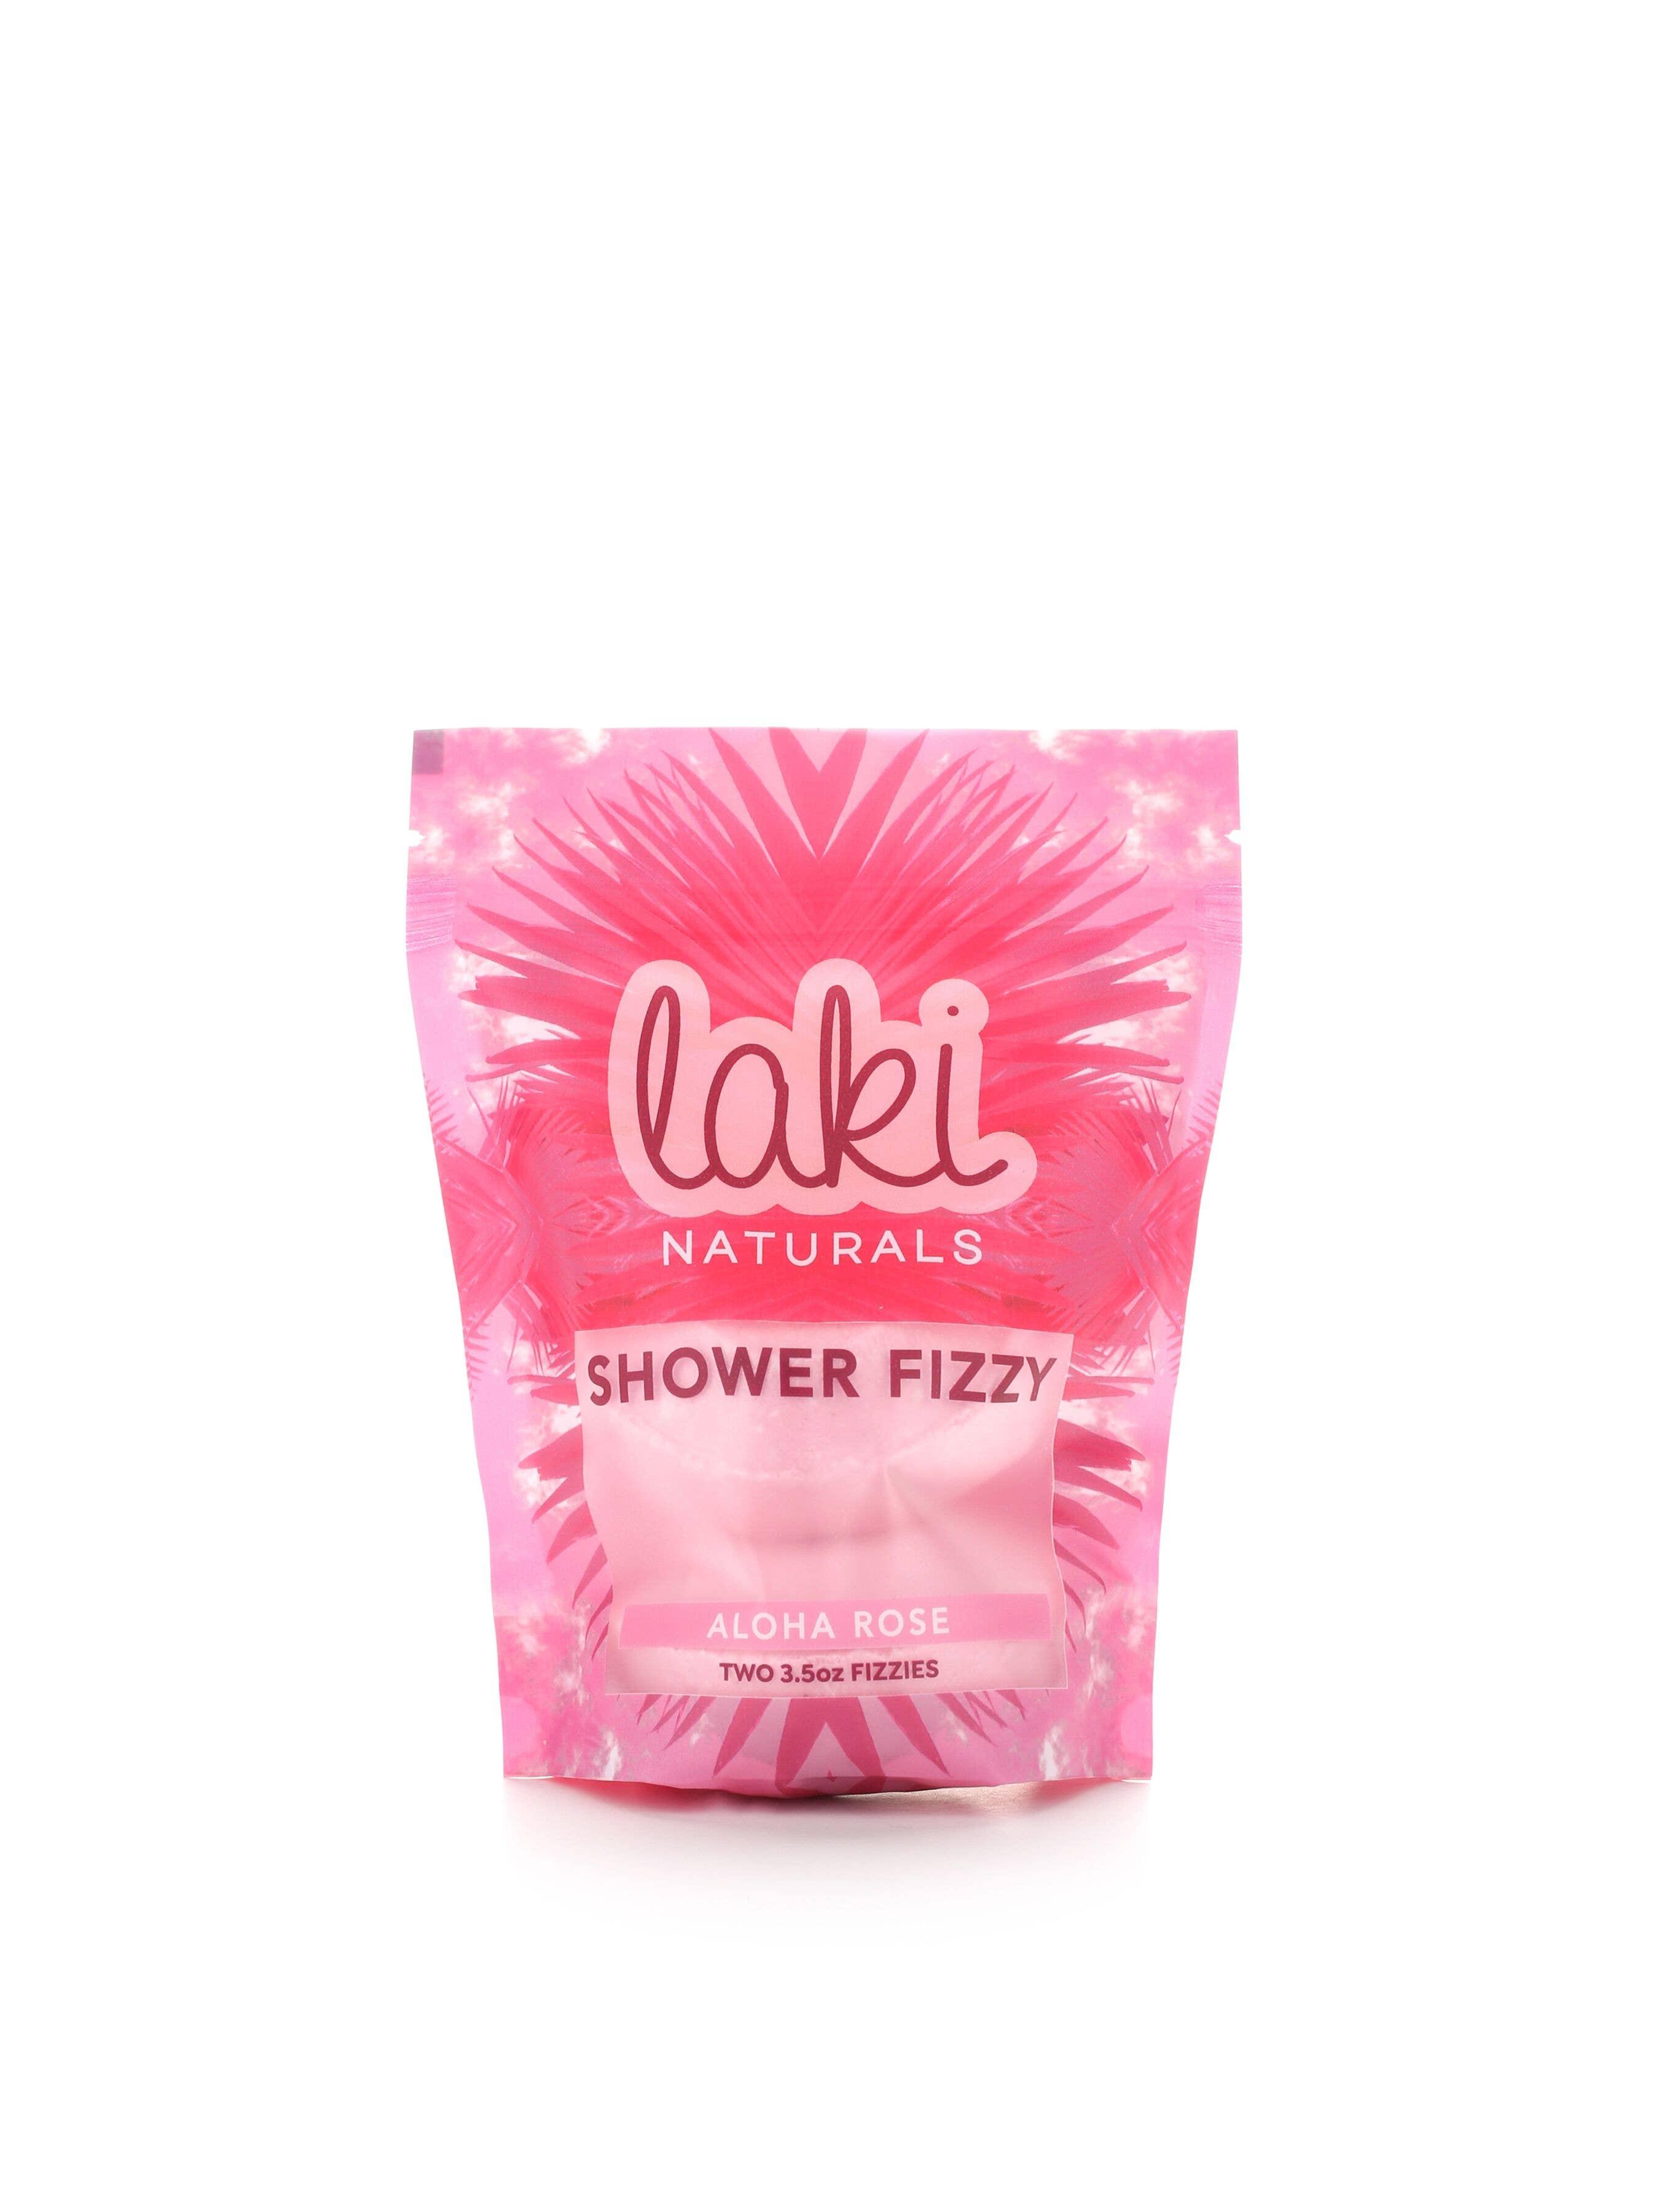 Aloha Rose Shower Fizzy | Trada Marketplace